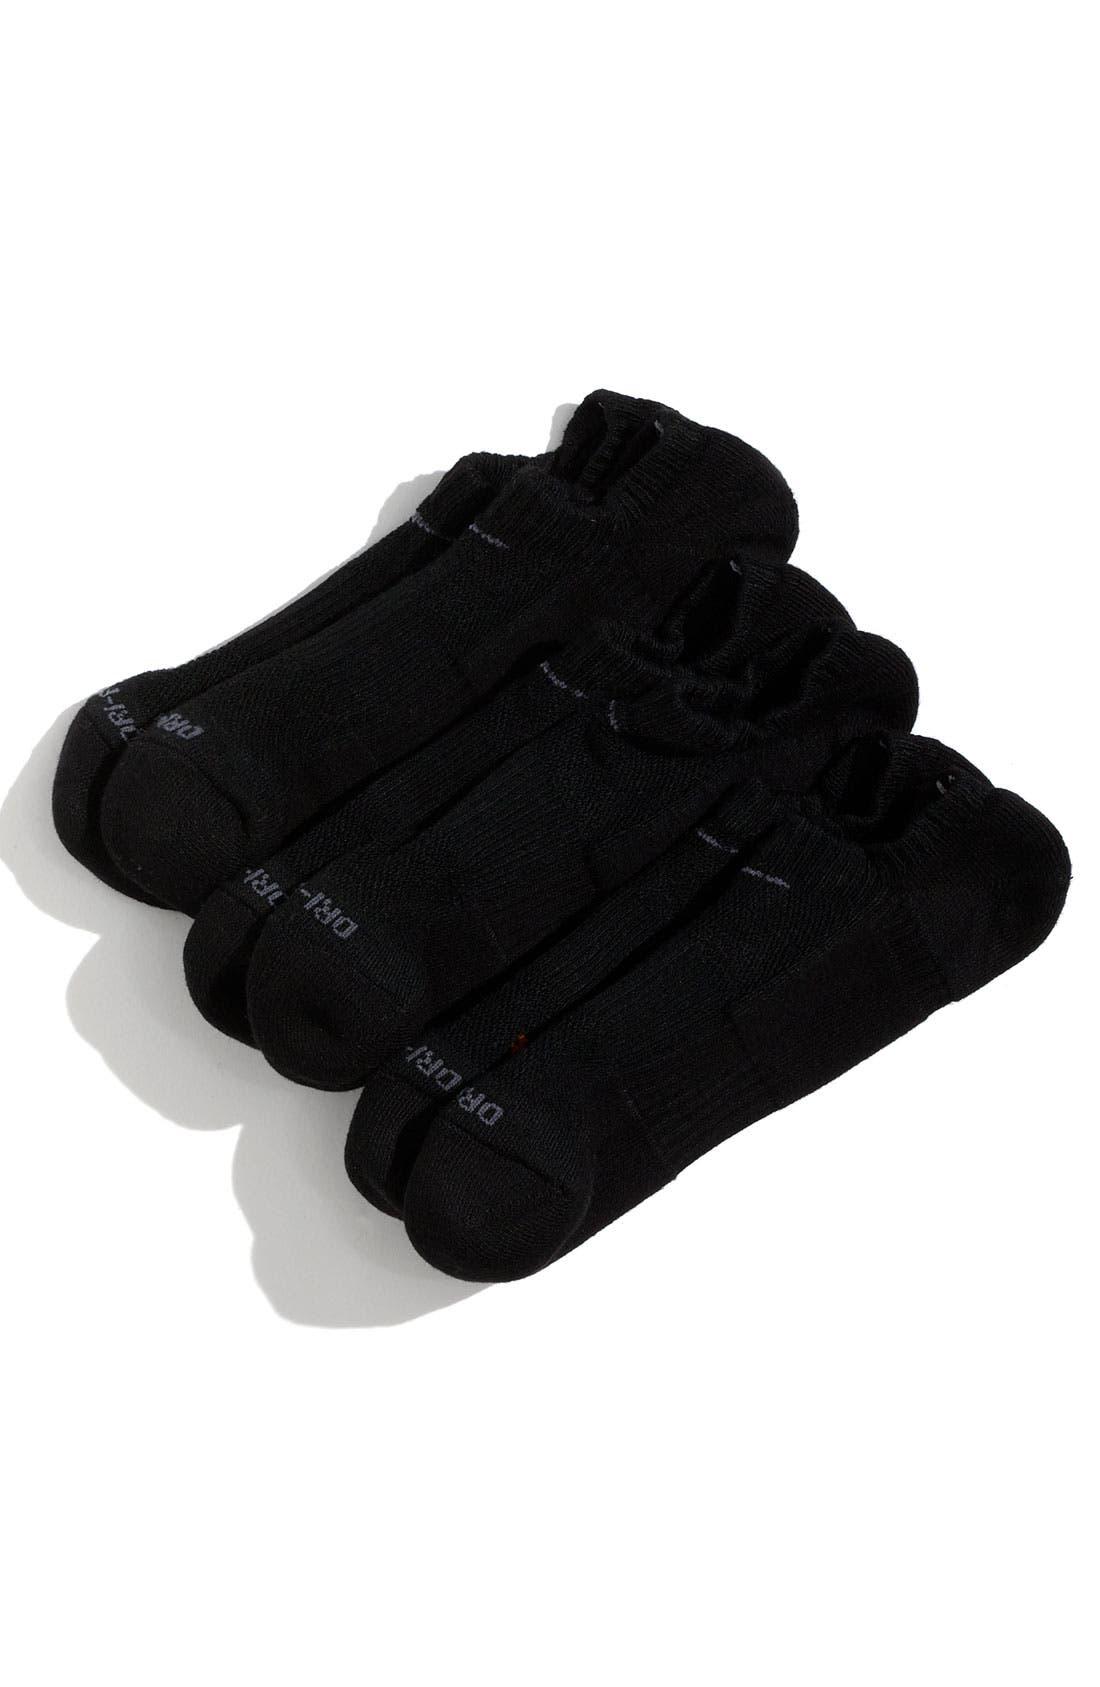 Main Image - Nike Dri-FIT No-Show Socks (3-Pack) (Little Boys & Big Boys)